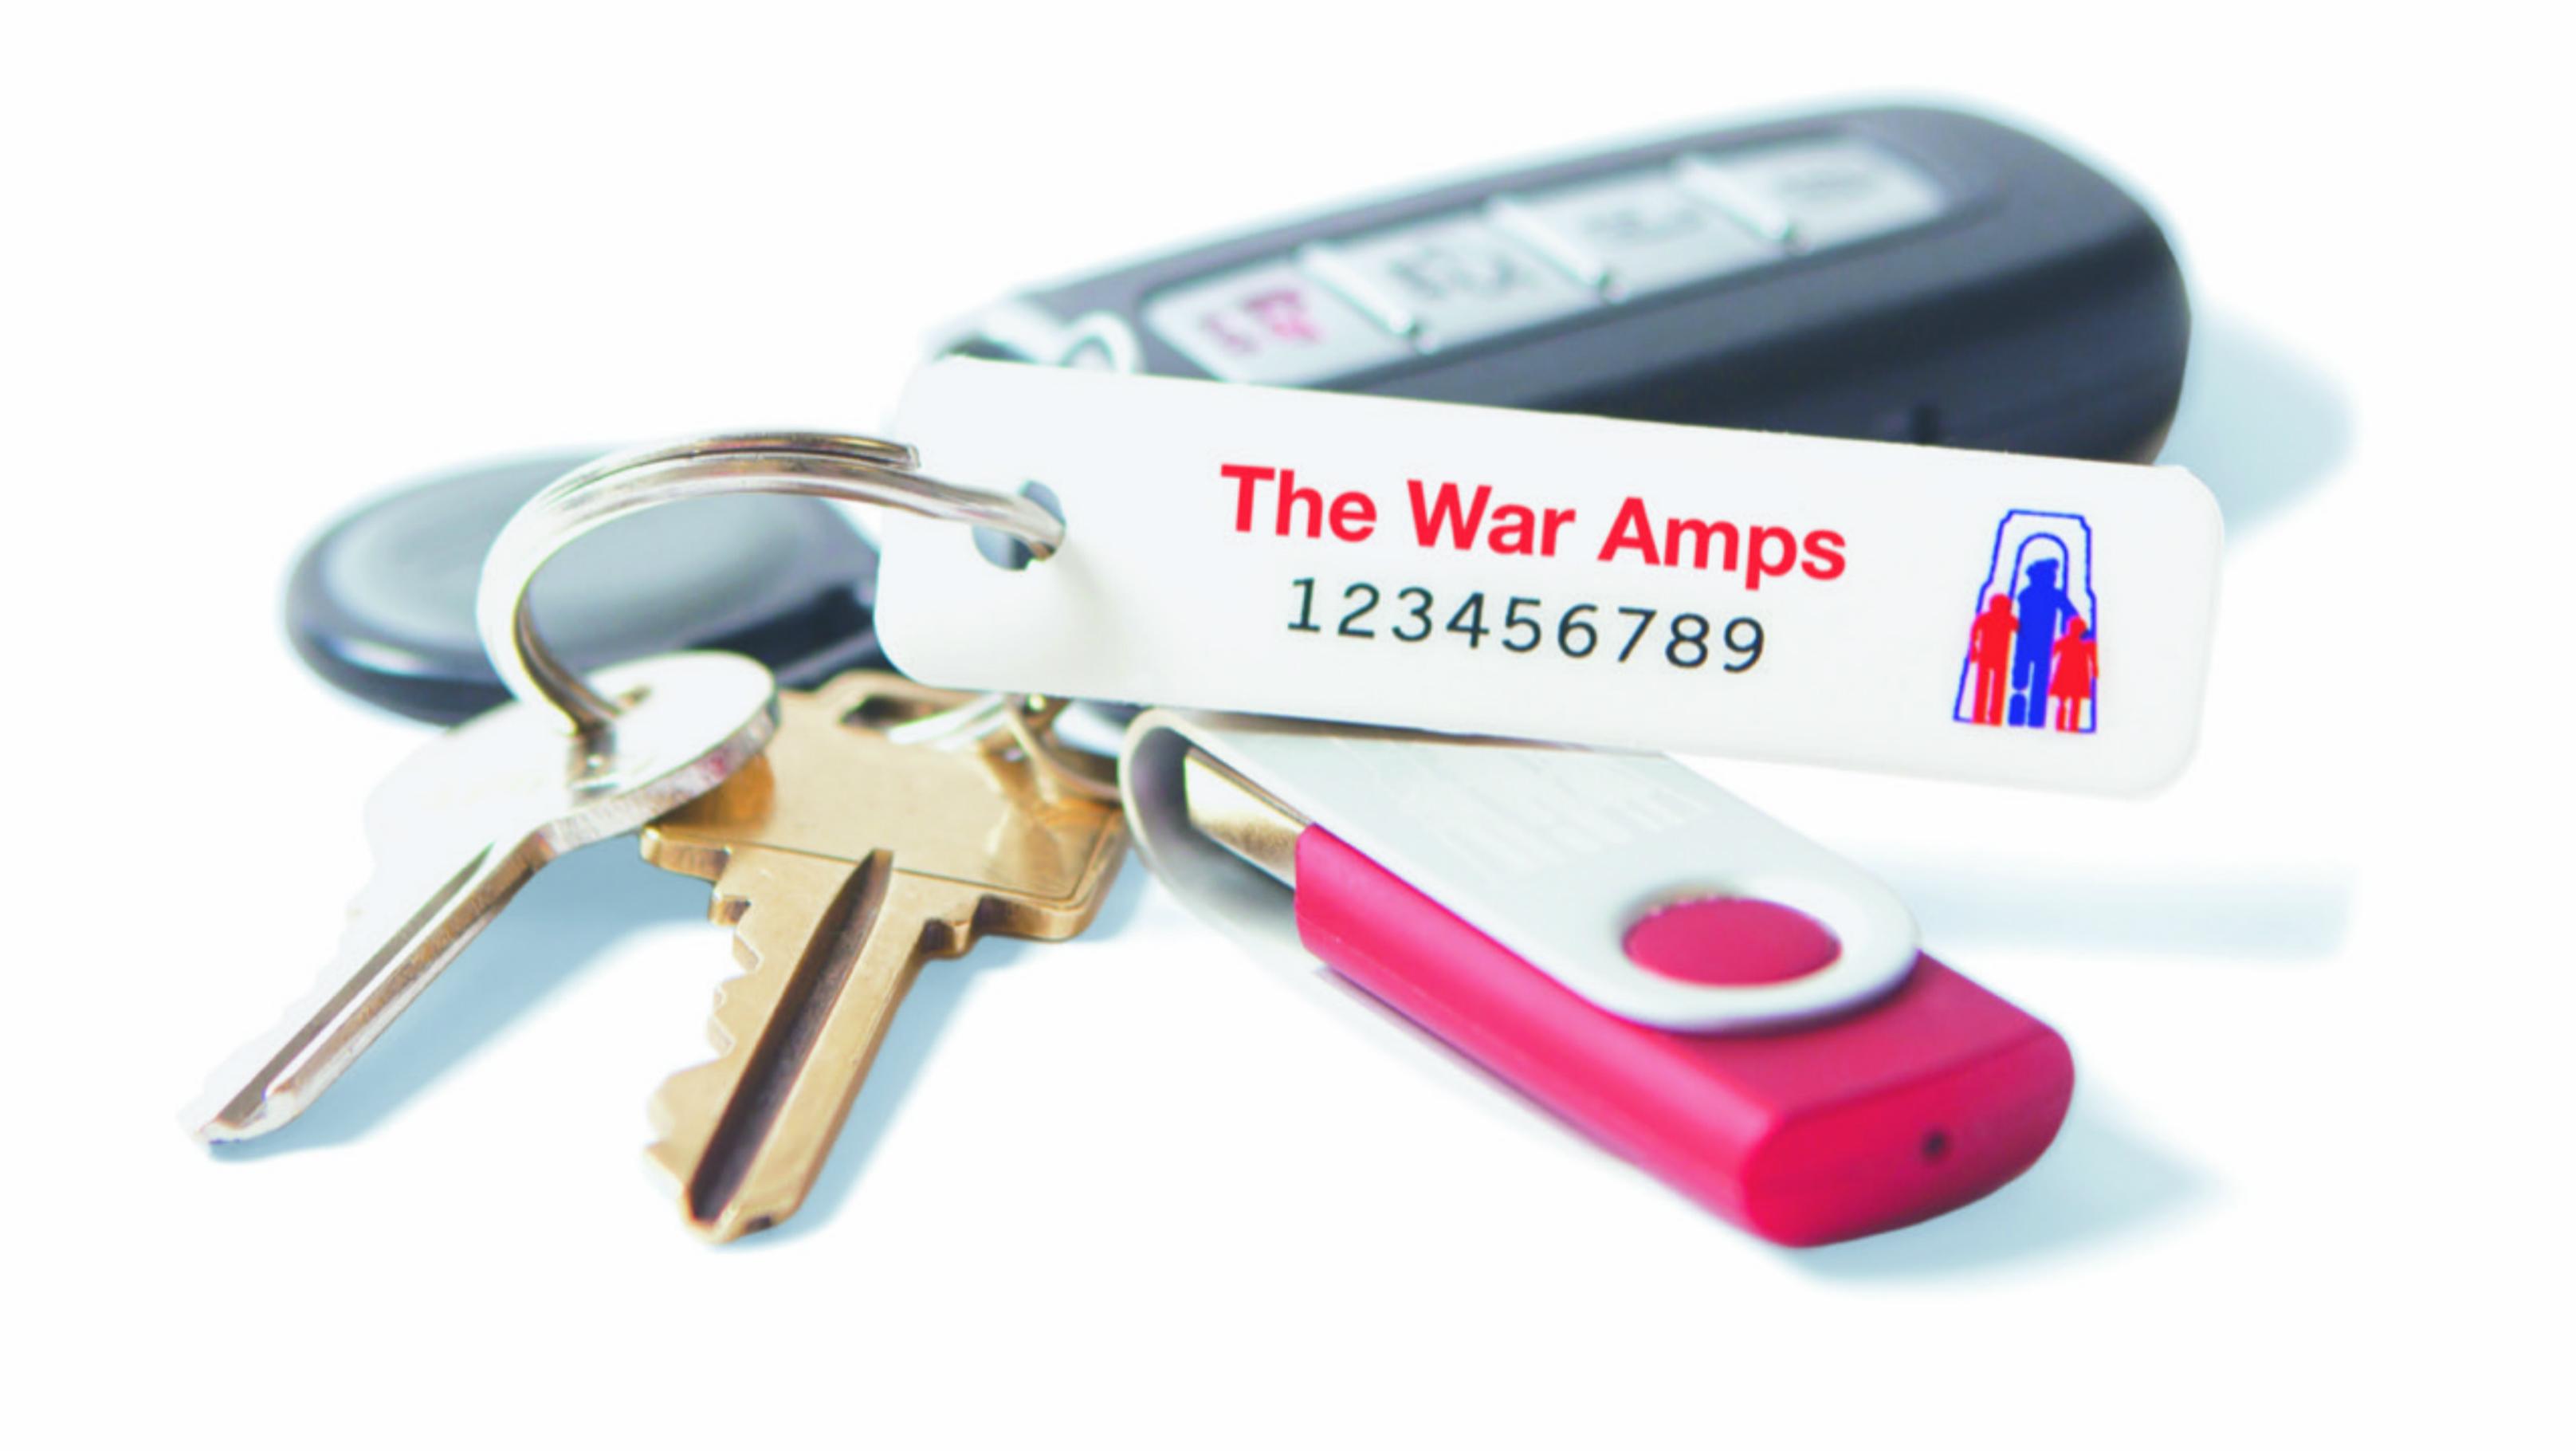 War Amps